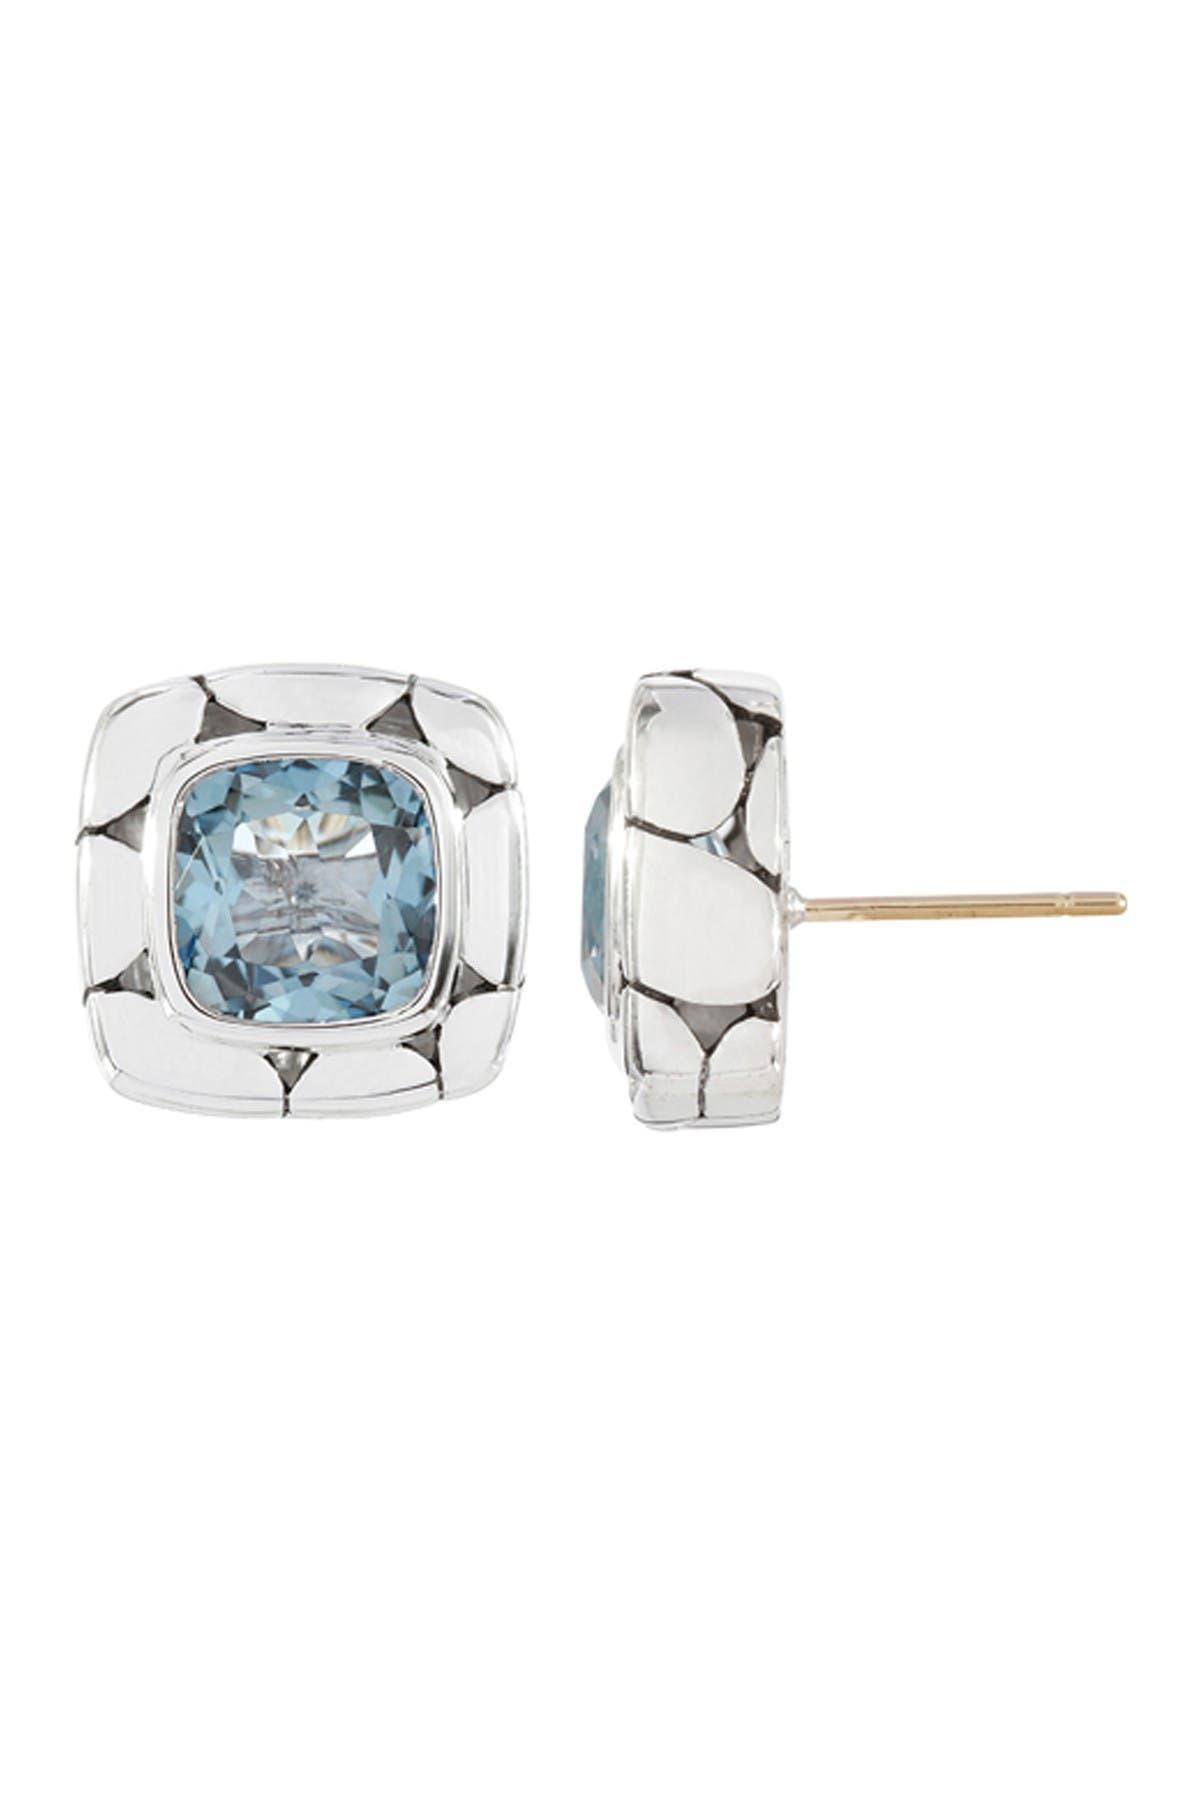 Image of JOHN HARDY Sterling Silver Kali Blue Topaz Square Stud Earrings